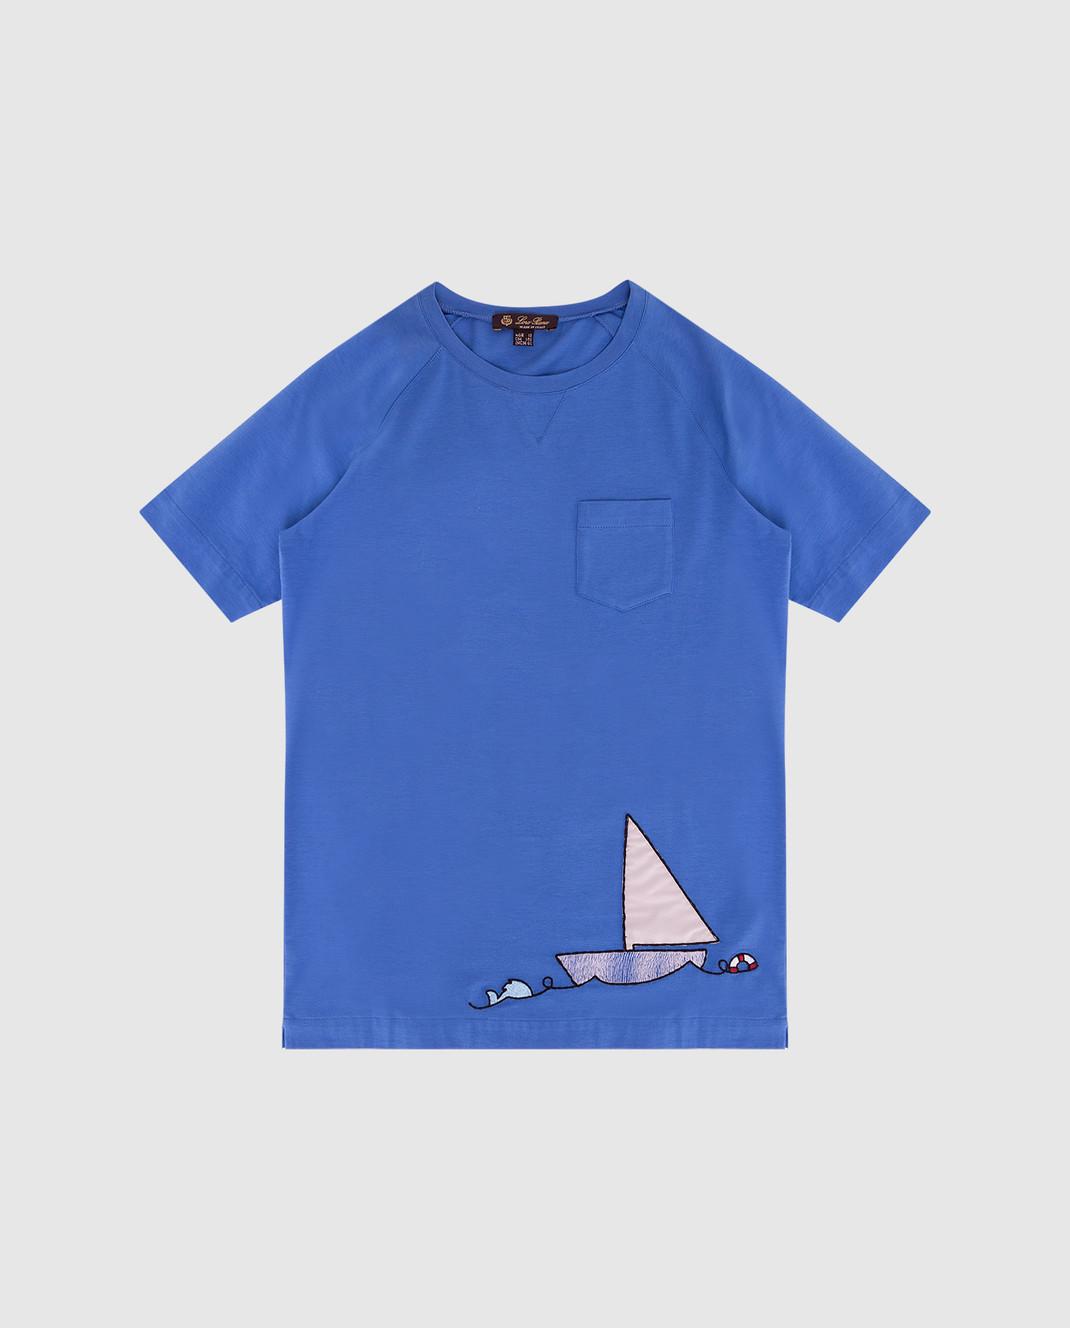 Loro Piana Детская синяя футболка F2FAI0800